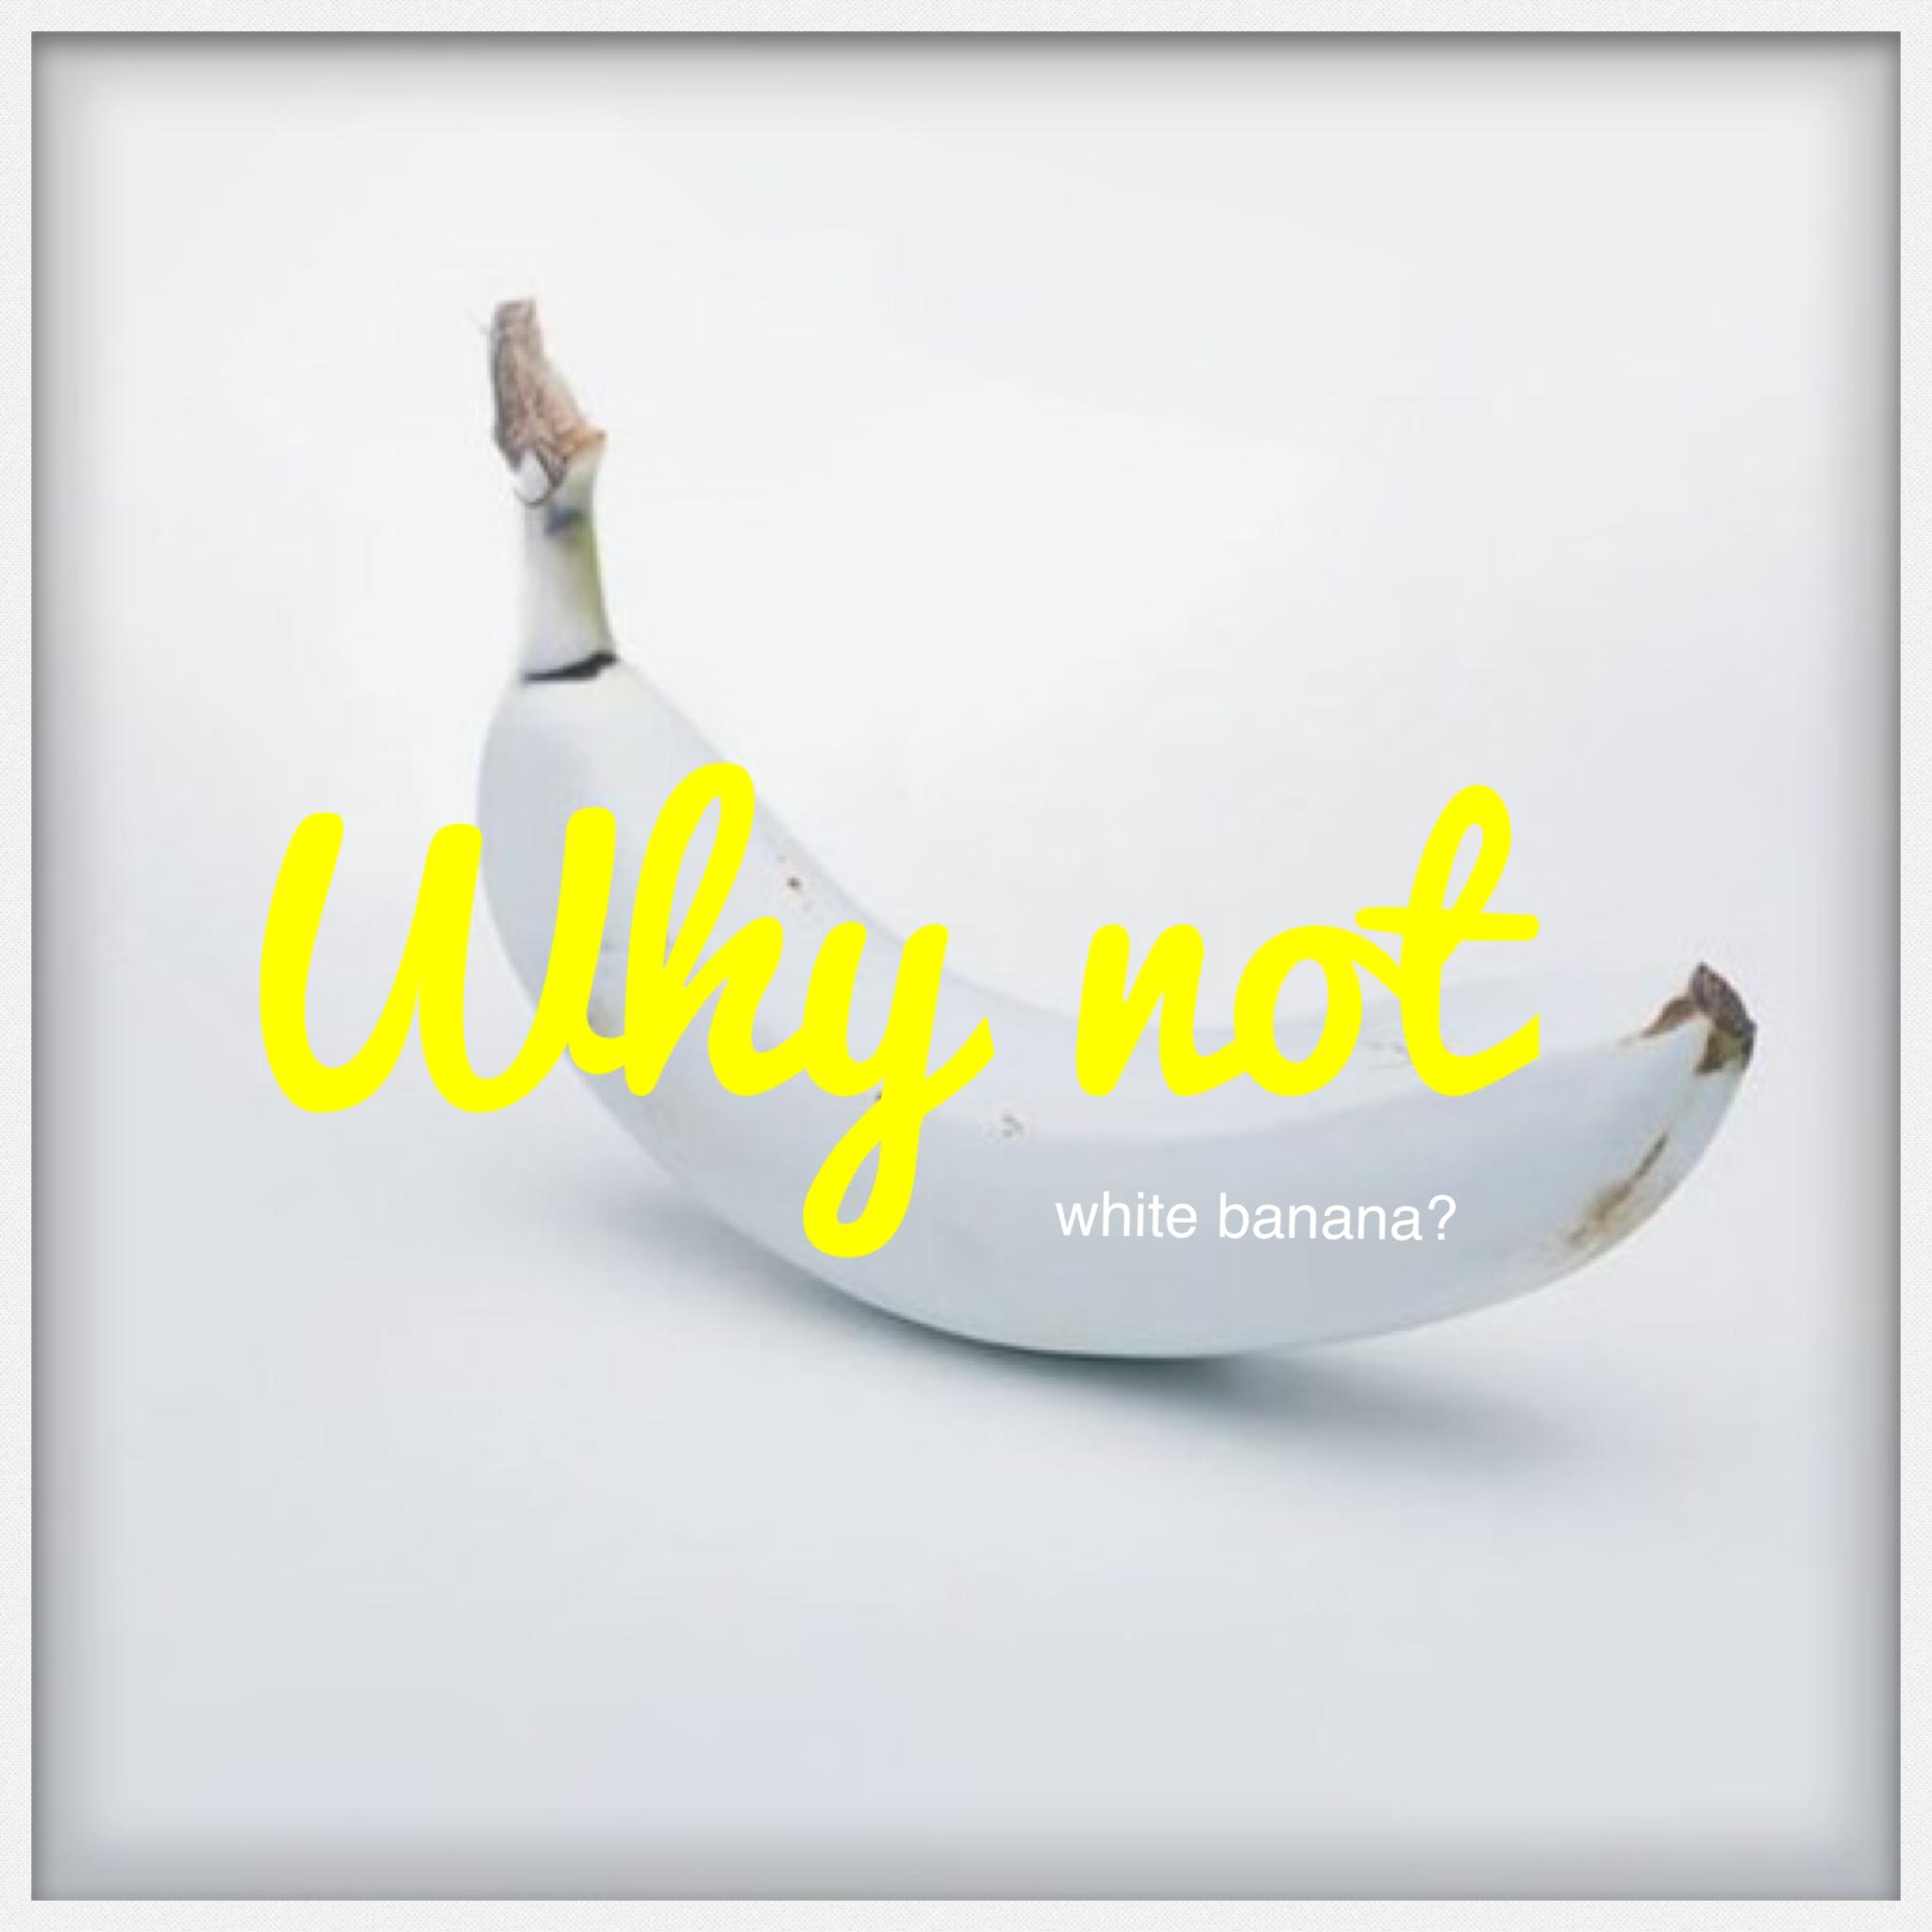 whitebanana.jpg